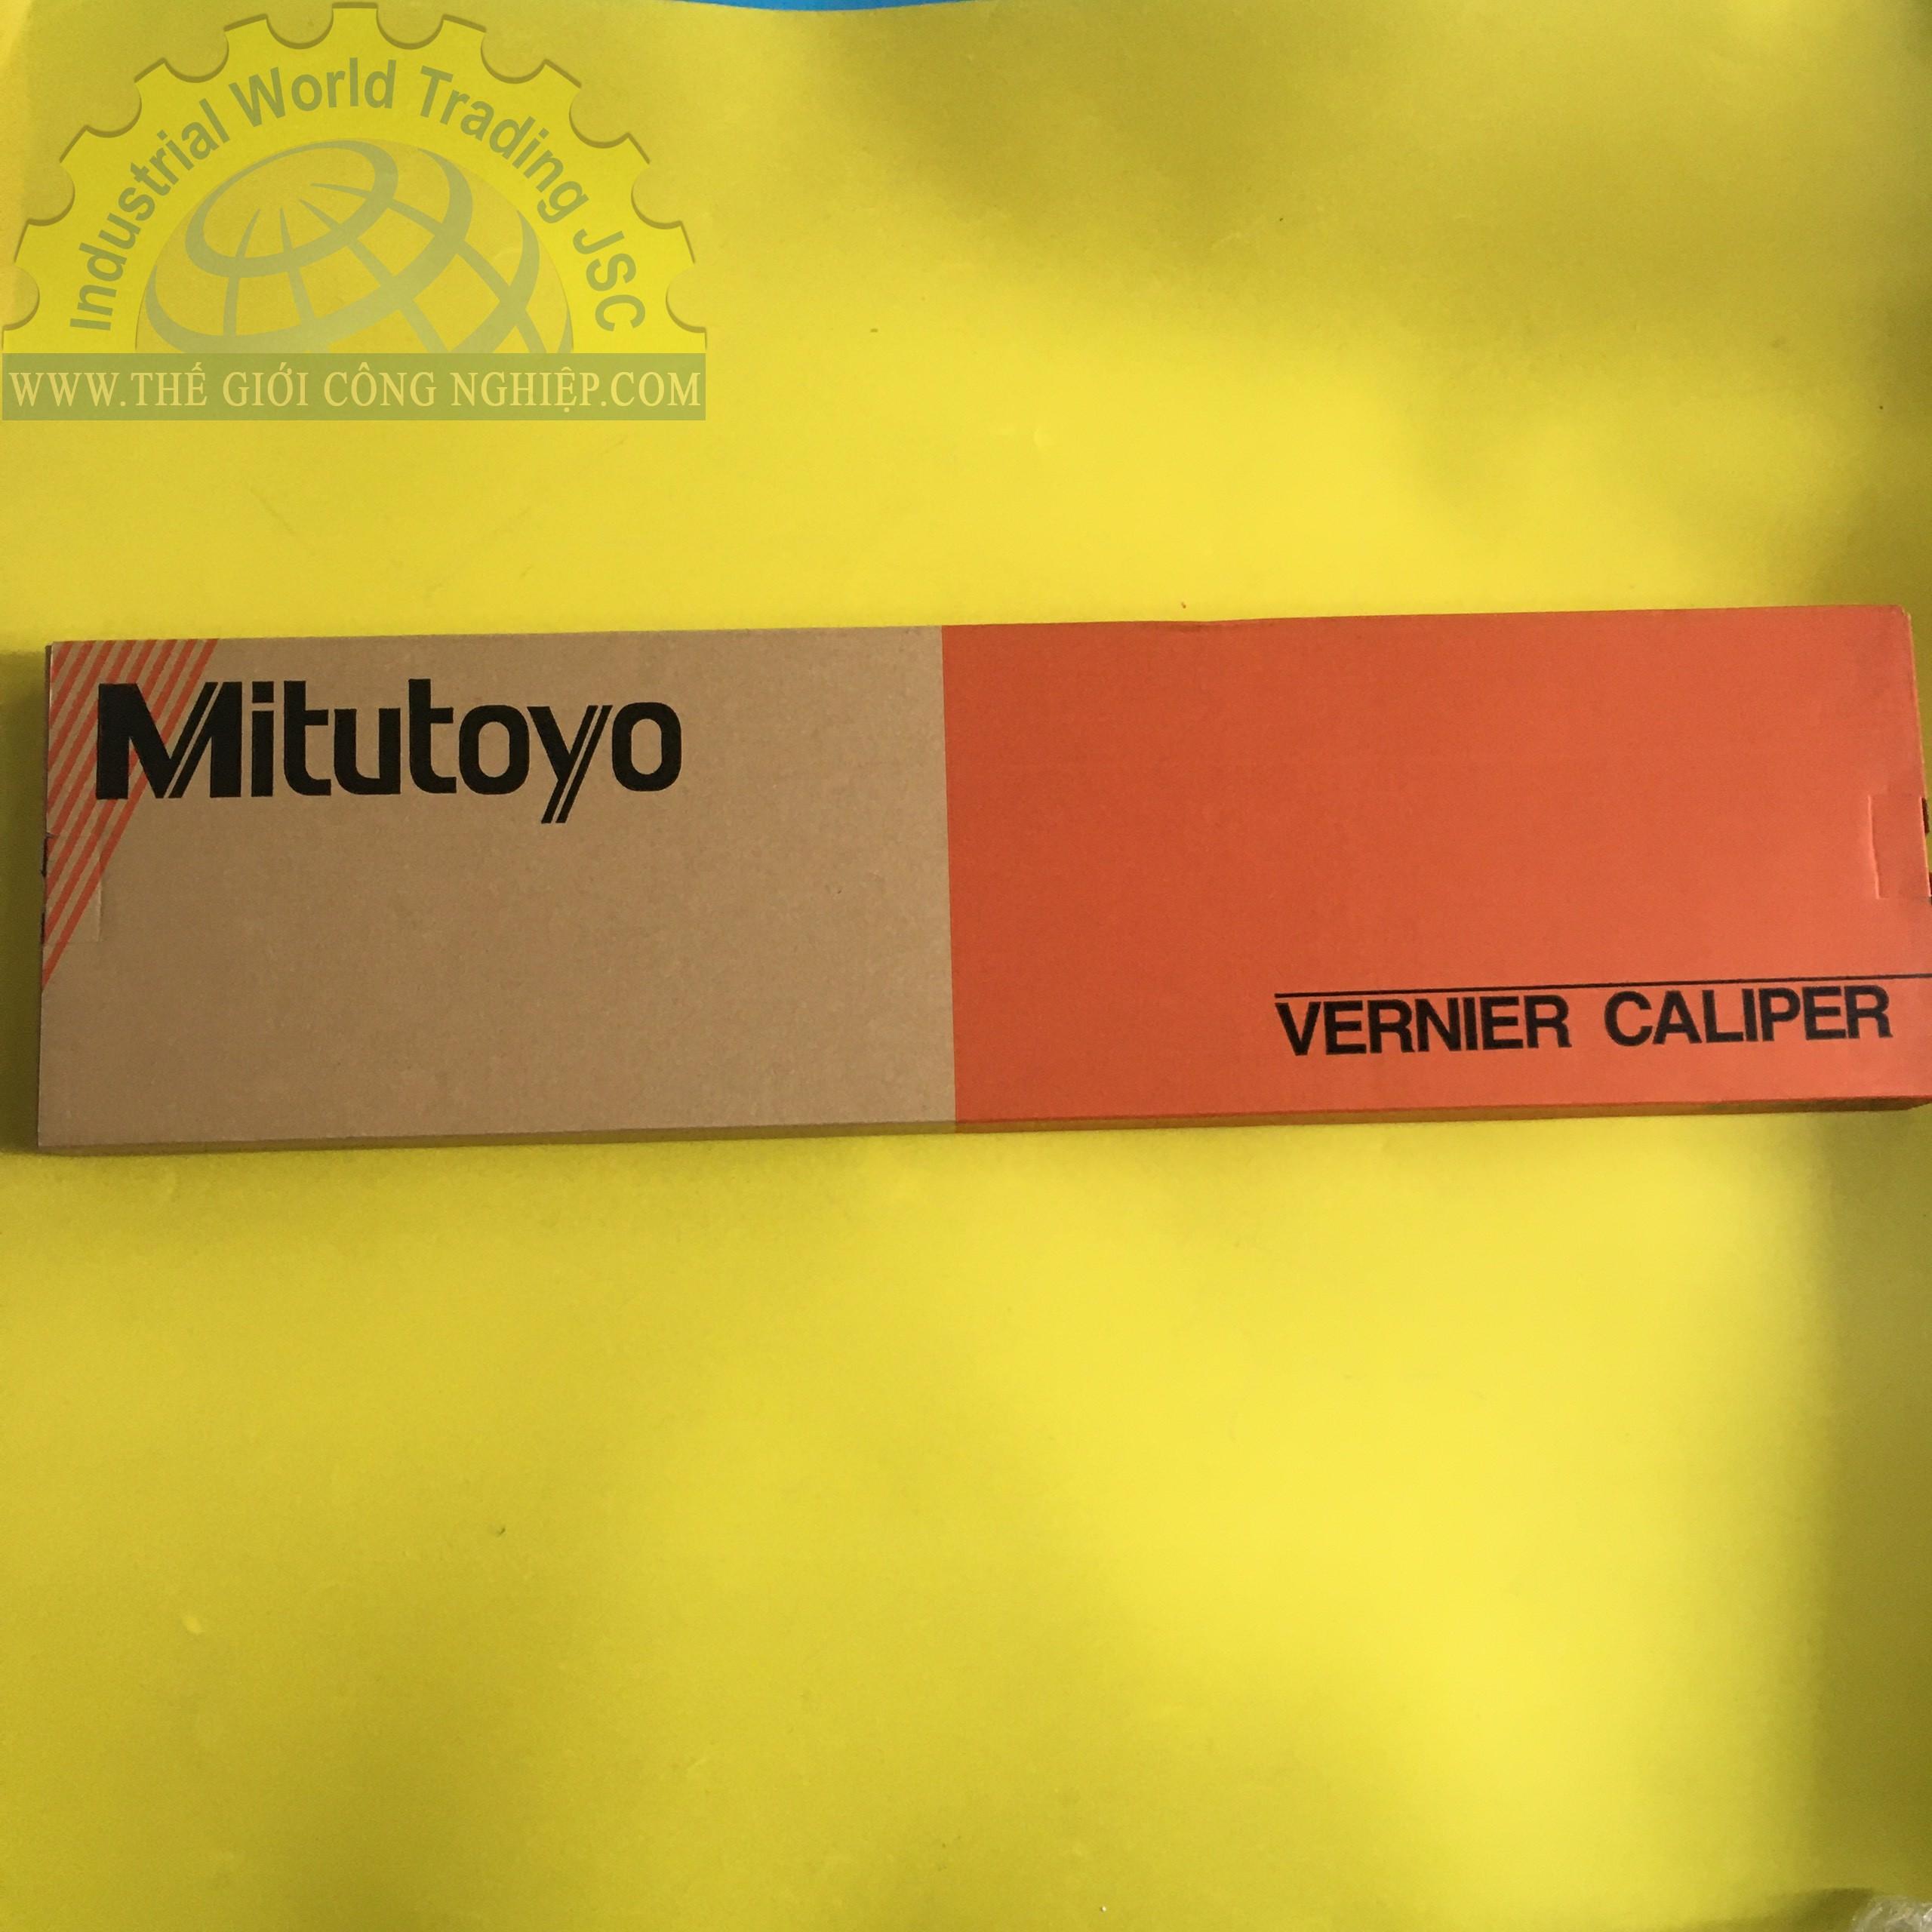 Vernier Calipers 530-501 MITUTOYO